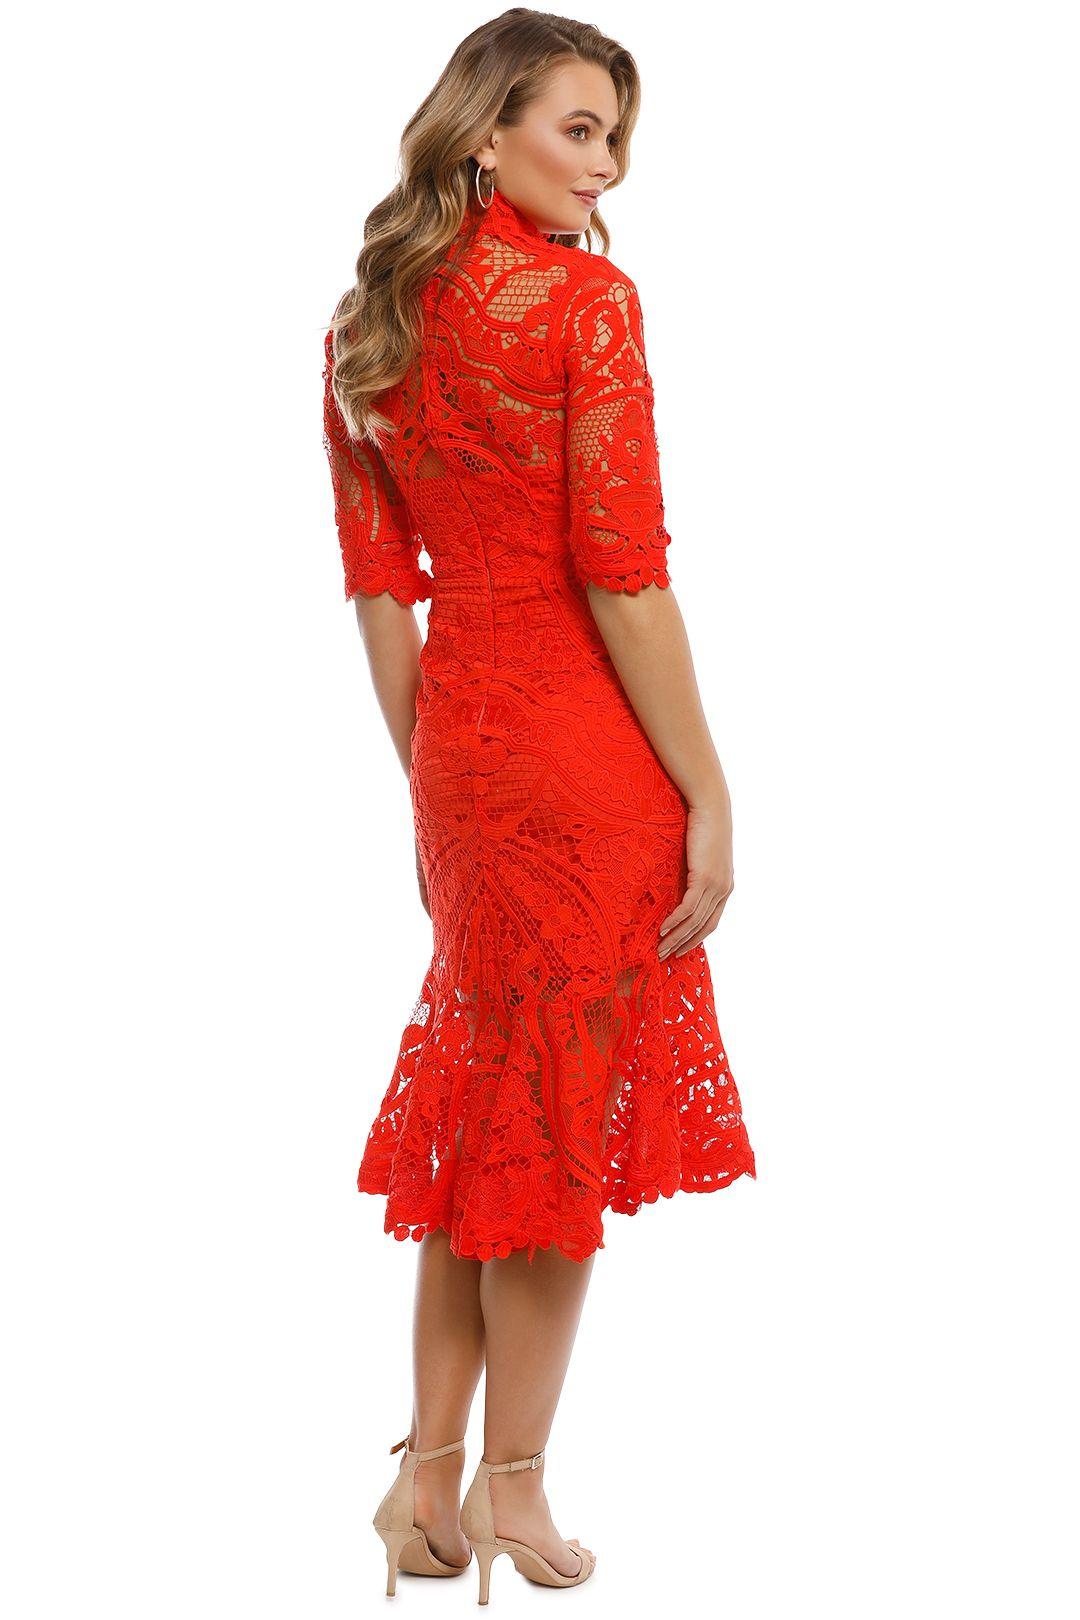 Thurley - Eternity Dress - Madarin - Back